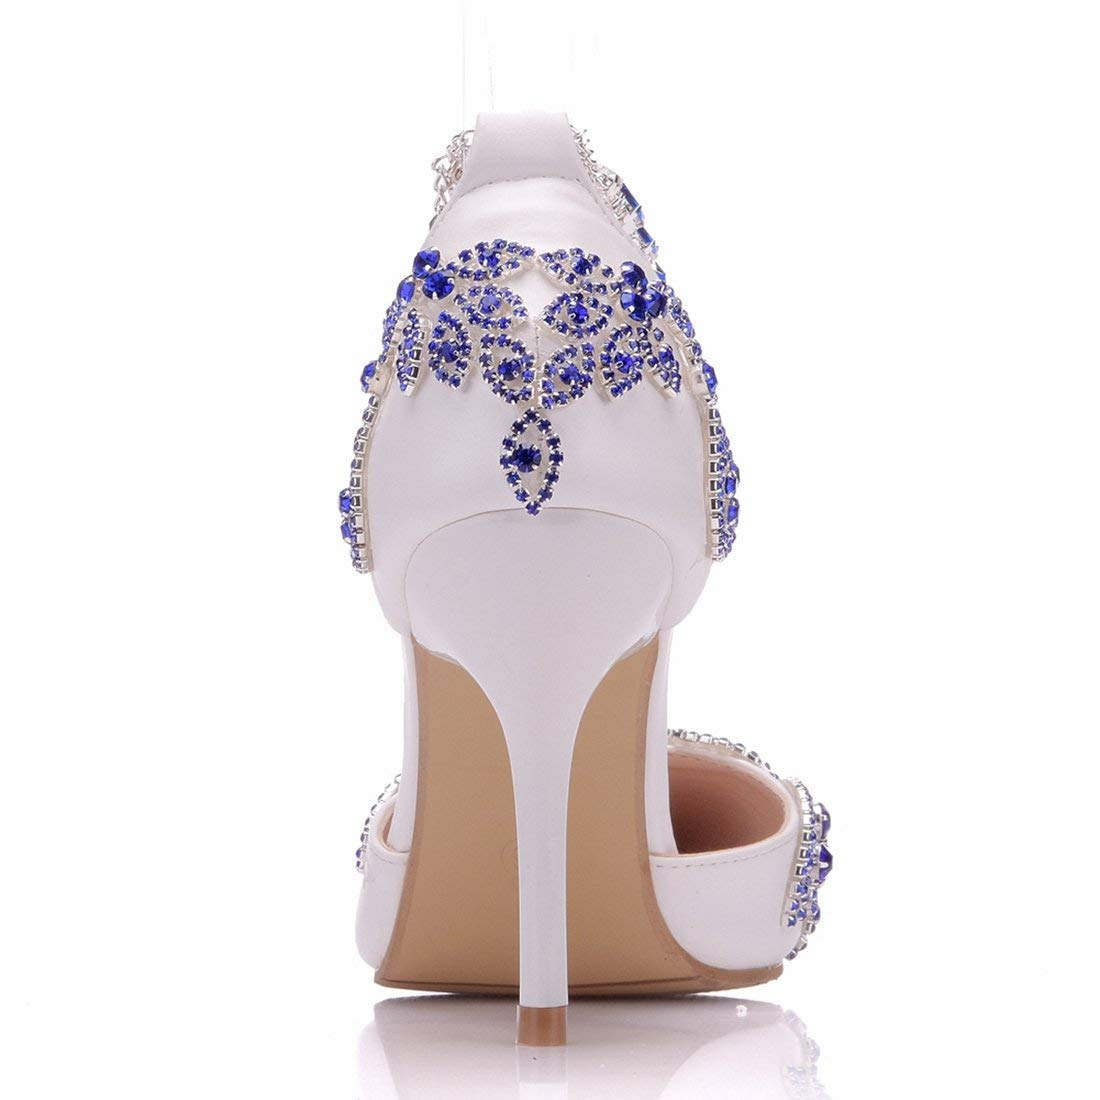 ZHRUI Damenmode Damenmode Damenmode Strass Knöchel Ketten Satin Outdoor Hochzeitspumpen (Farbe   Weiß-9cm Heel, Größe   2.5 UK) 5a0512